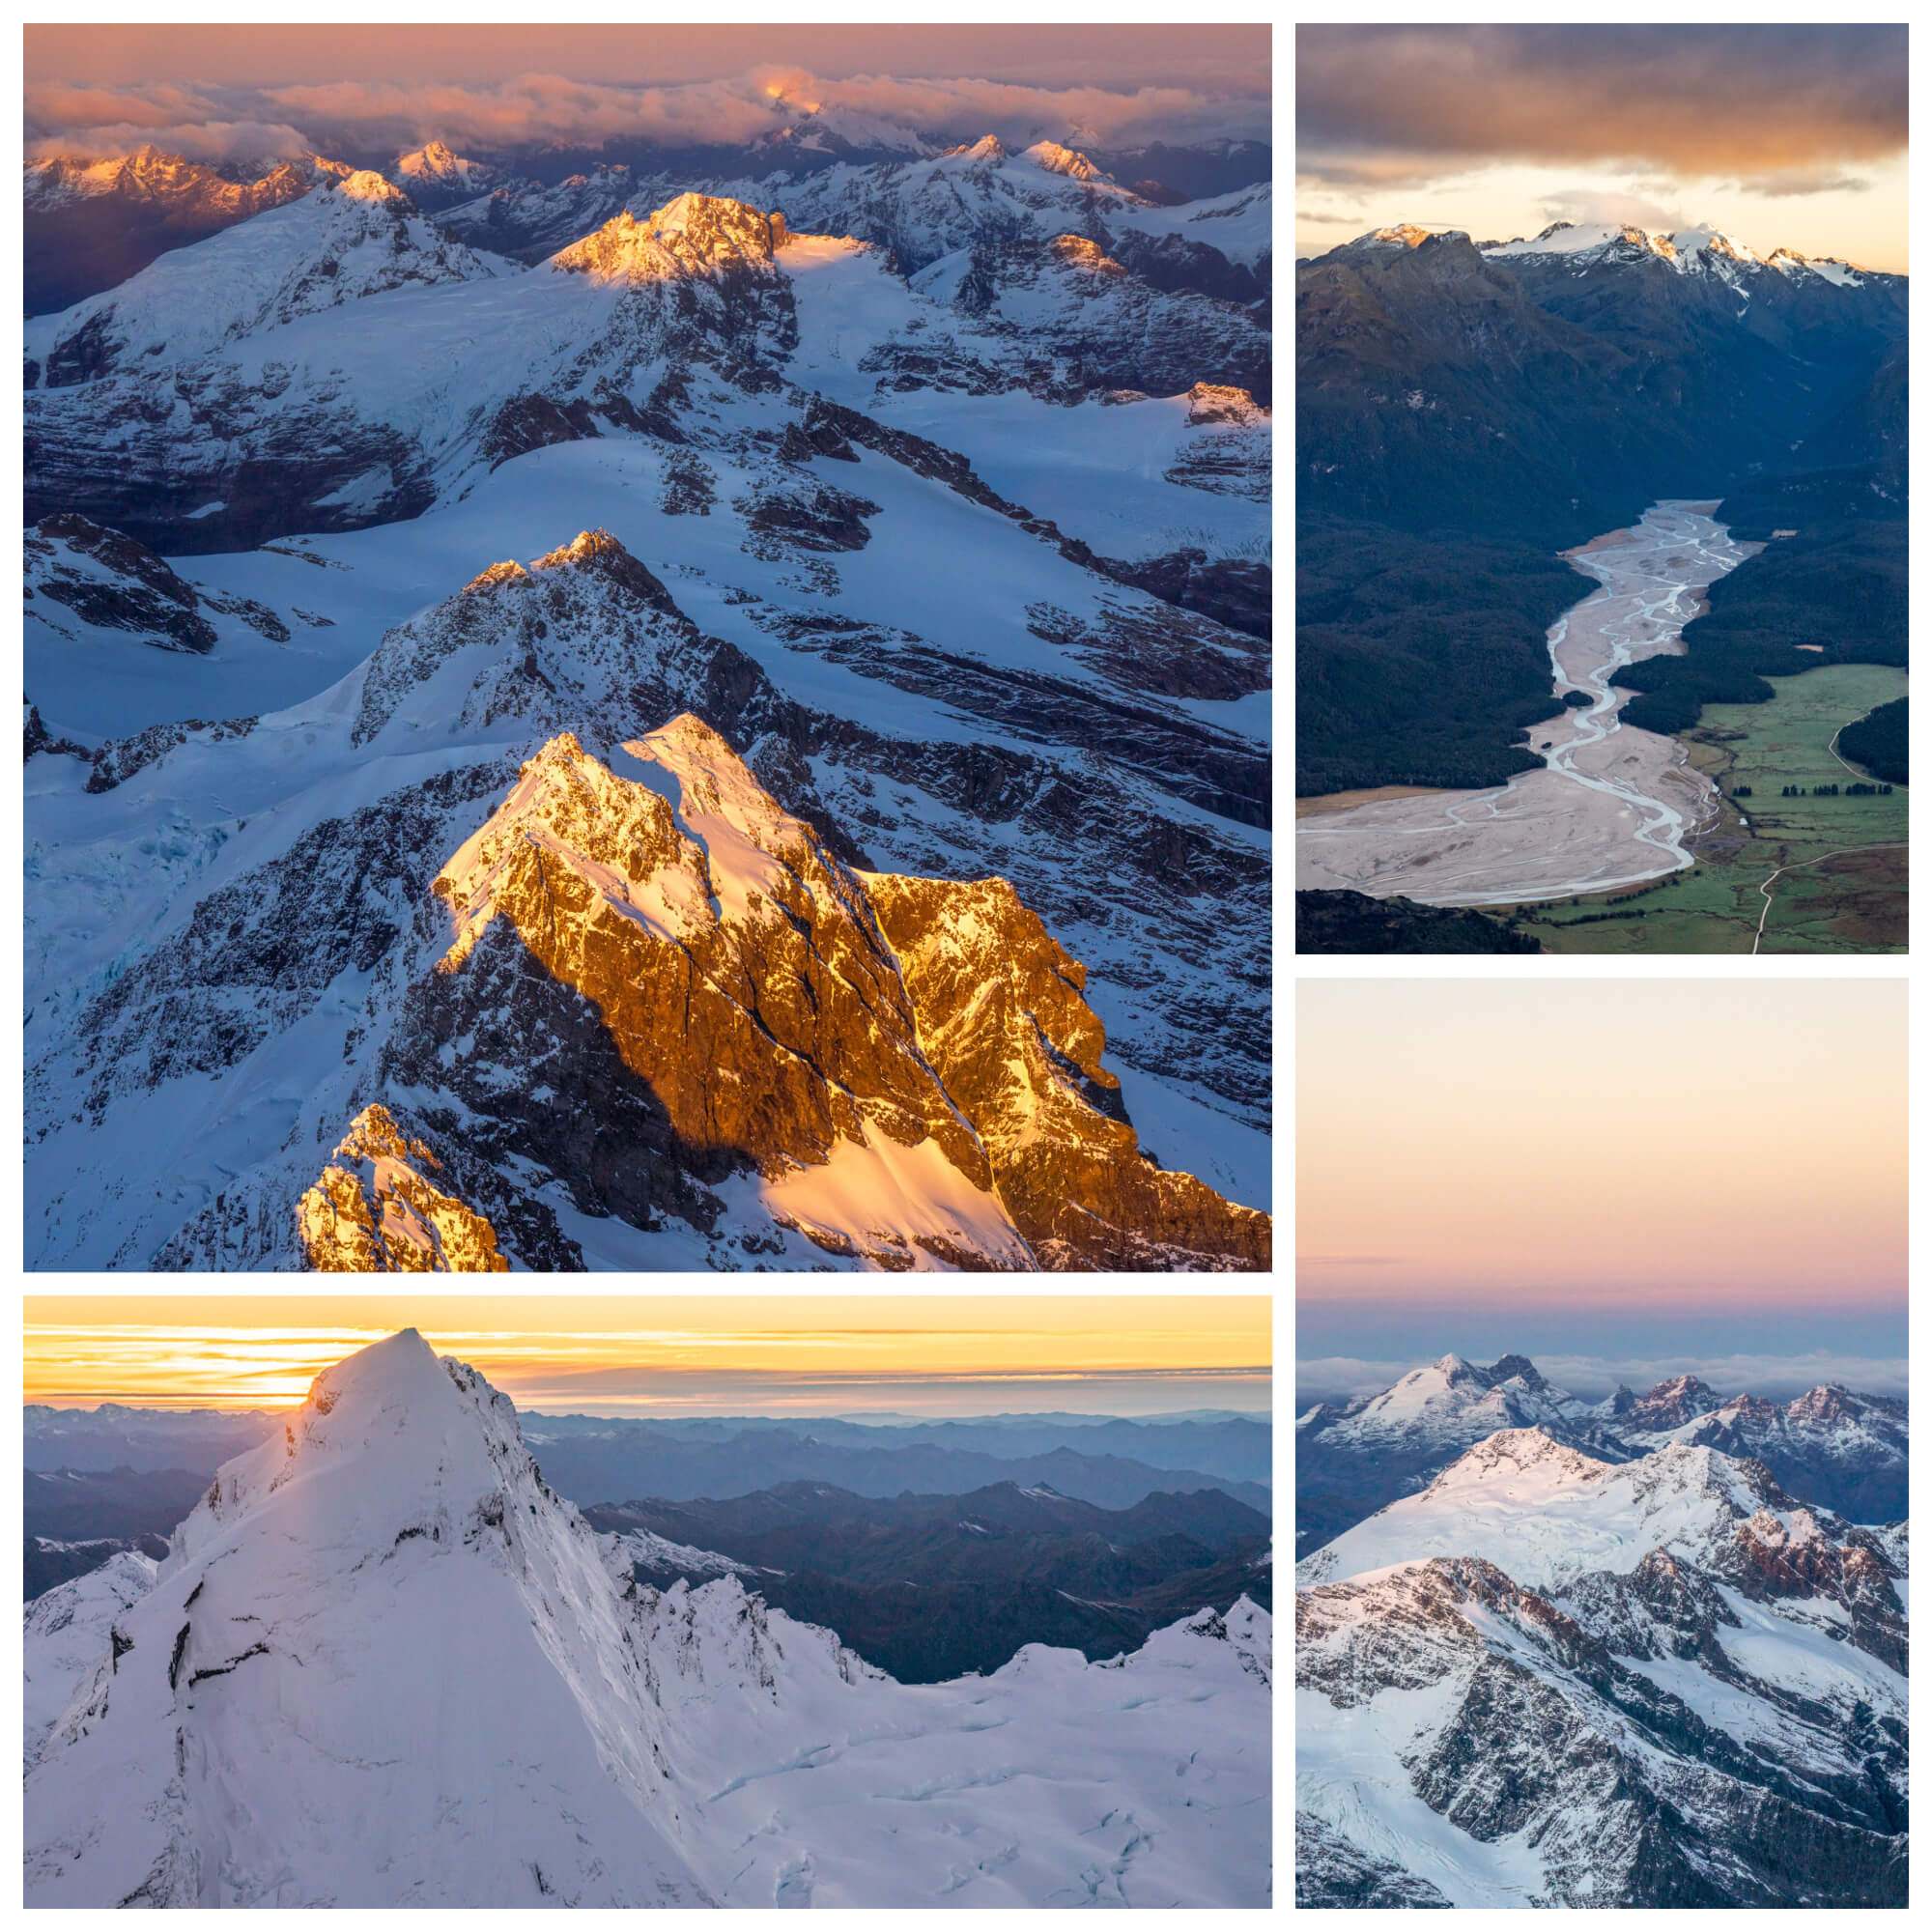 Glenorchy Air Mt Aspiring Sunrise Flight